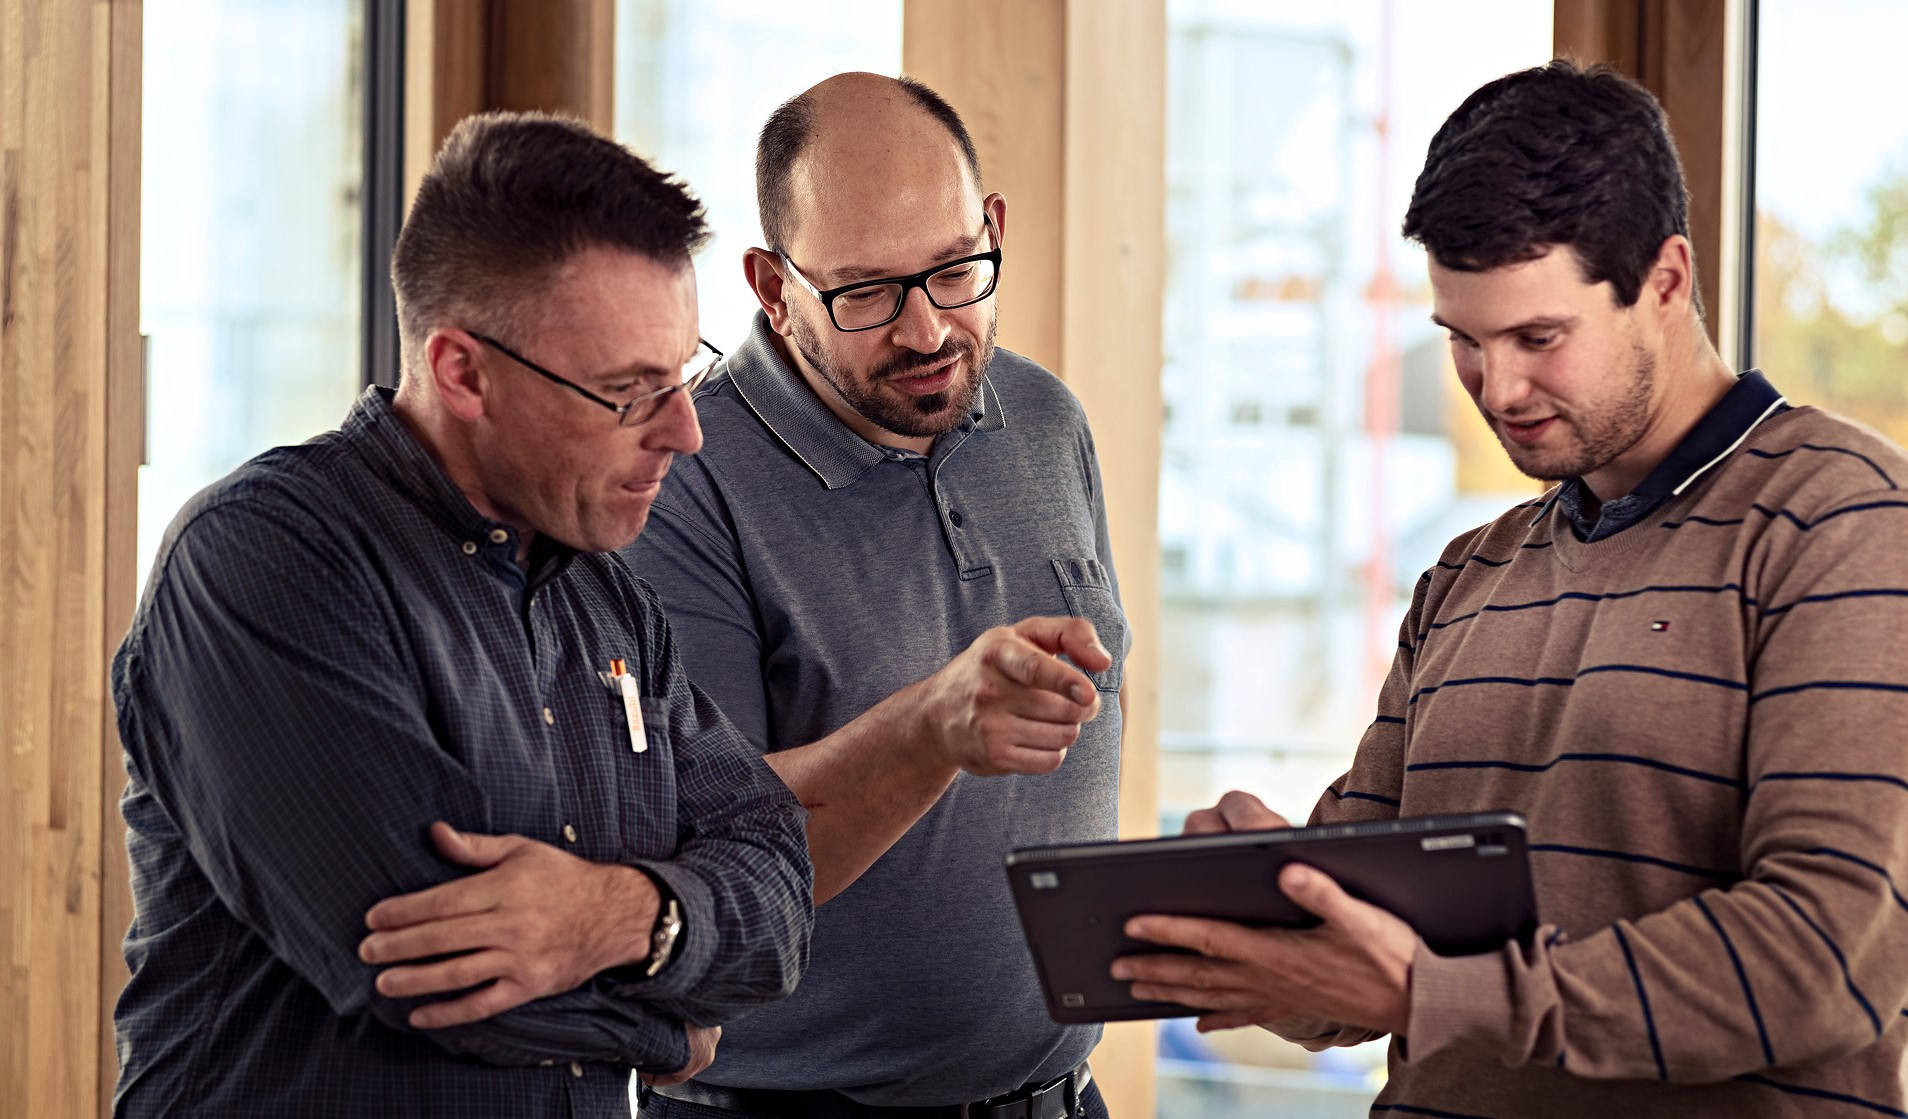 Miteinander Reden ist die Methode in agilen Projektteams.